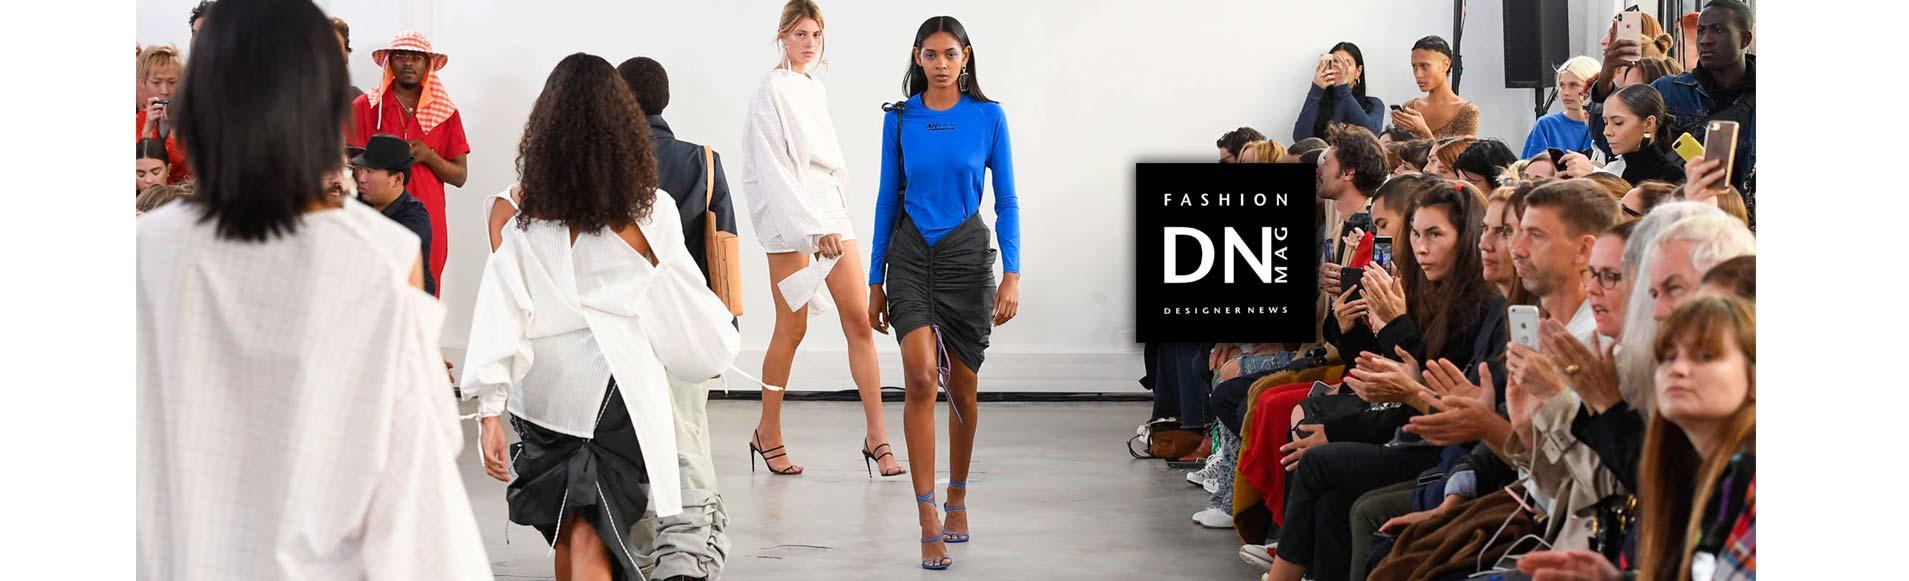 DNMAG-afterhomework ss19 - paris fashion week 2018